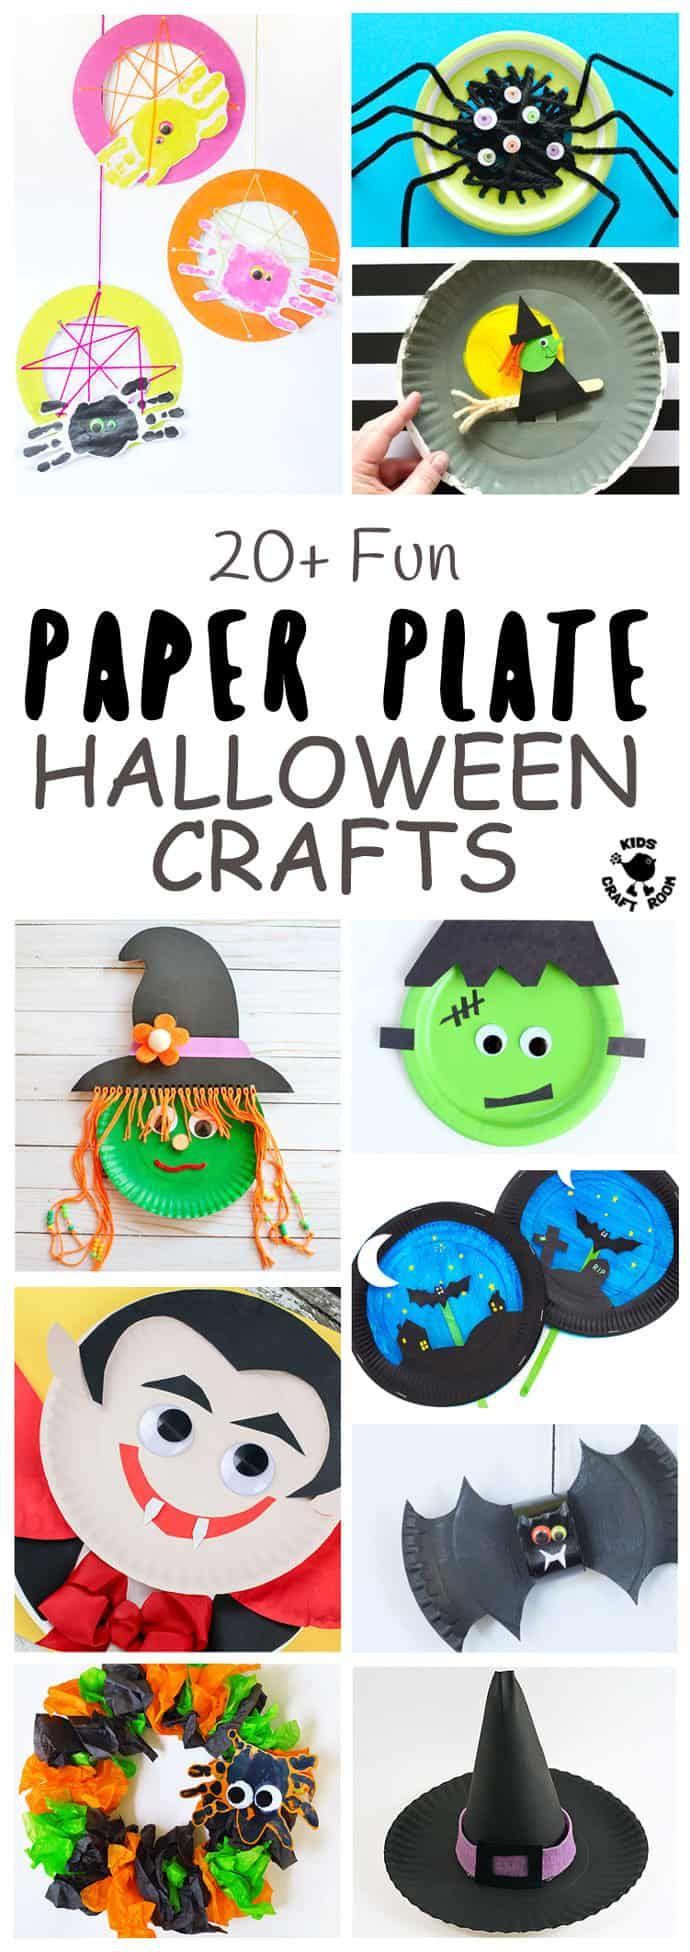 20+ Fun Paper Plate Halloween Crafts Halloween crafts